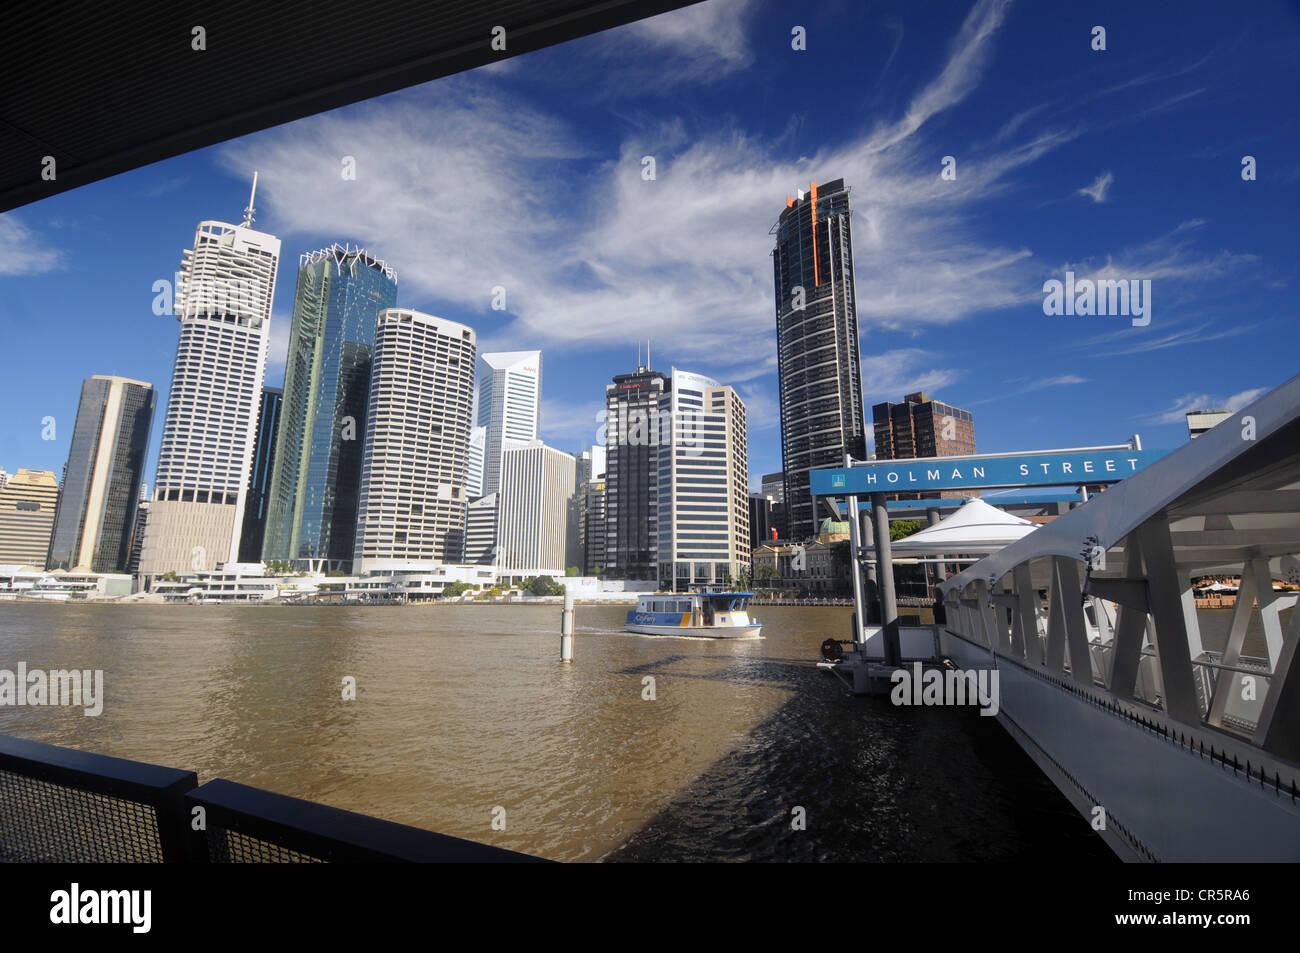 City ferry arriving at Holman Street station, Brisbane, Queensland, Australia. No PR - Stock Image